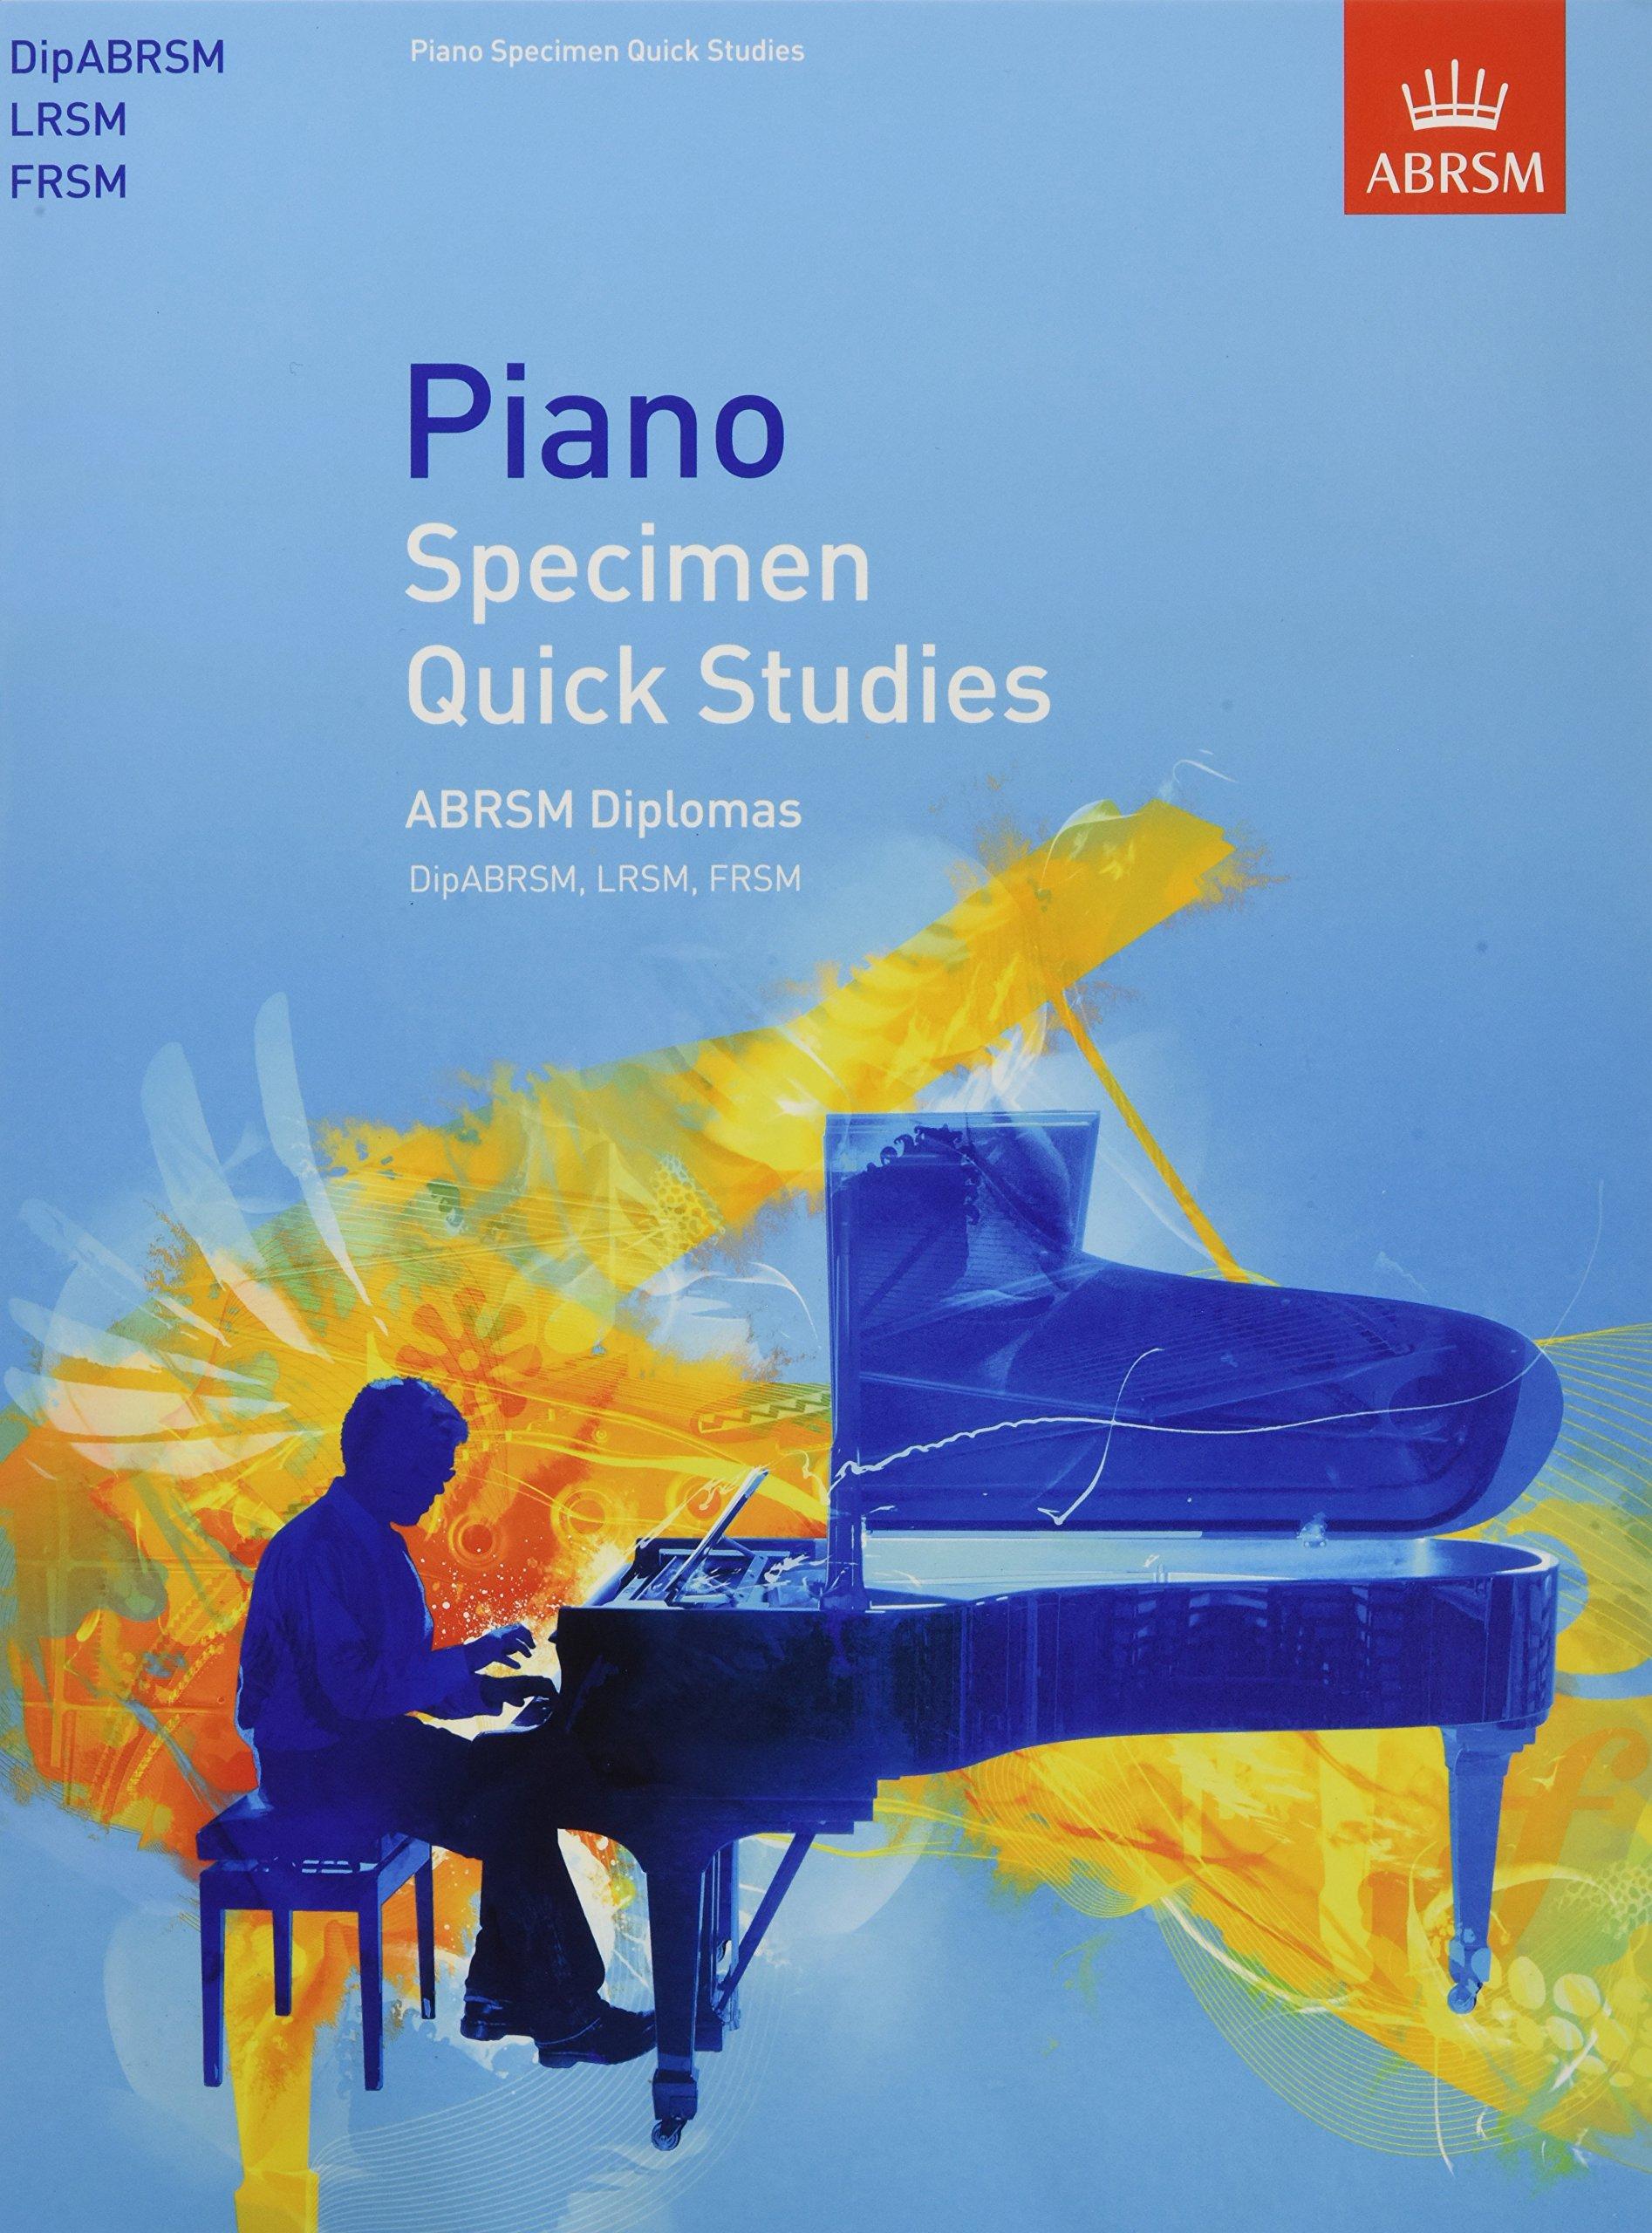 Read Online Piano Specimen Quick Studies: ABRSM Diplomas (DipABRSM, LRSM, FRSM) (ABRSM Sight-reading) PDF